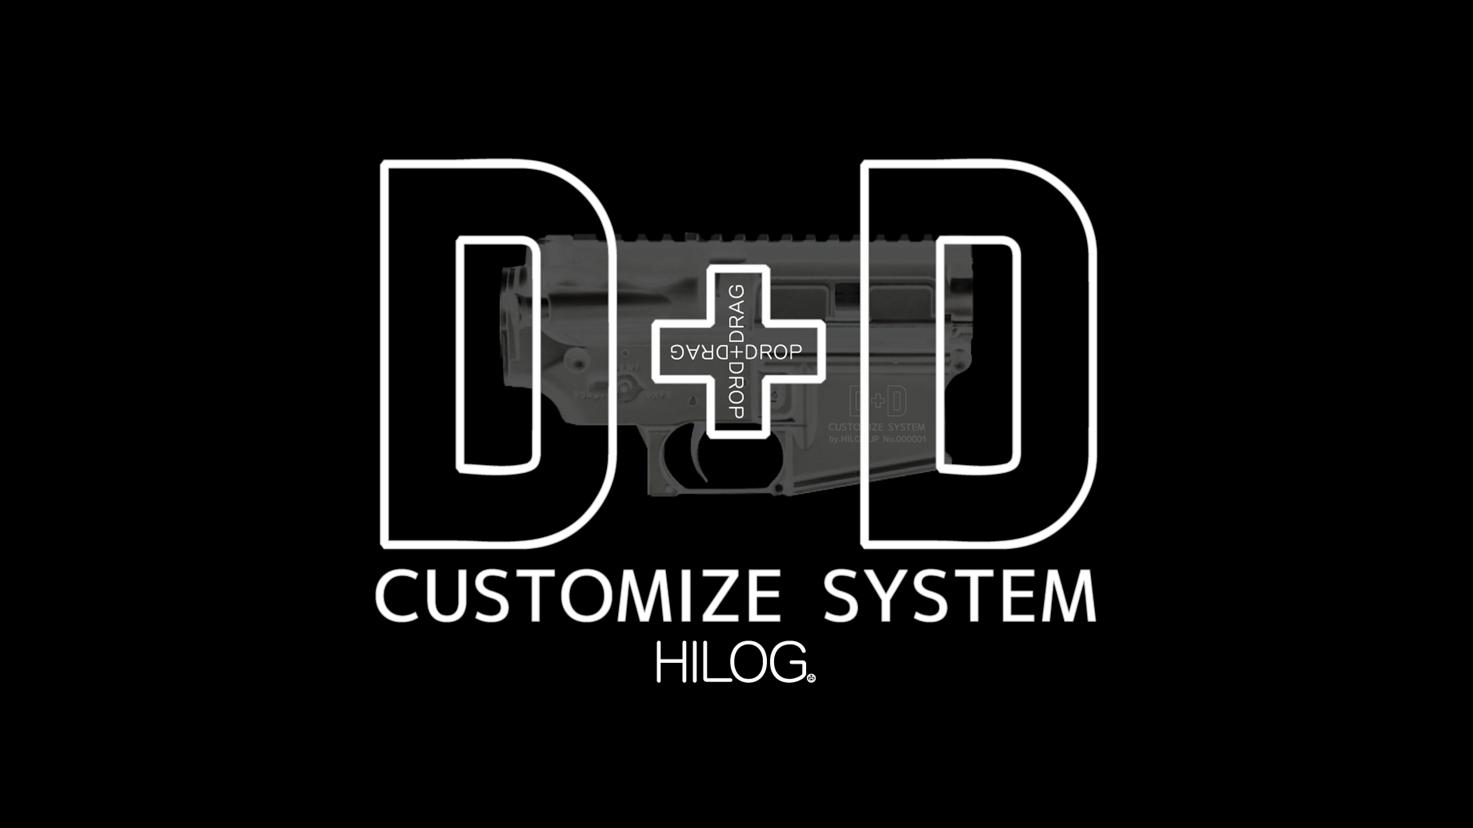 1 HILOG D+D-CUSTOMIZE-SYSTEM エアガン ガスガン 電動ガン 次世代 トレポン 実物 カスタム カスタマイズ システム アイテム リリース